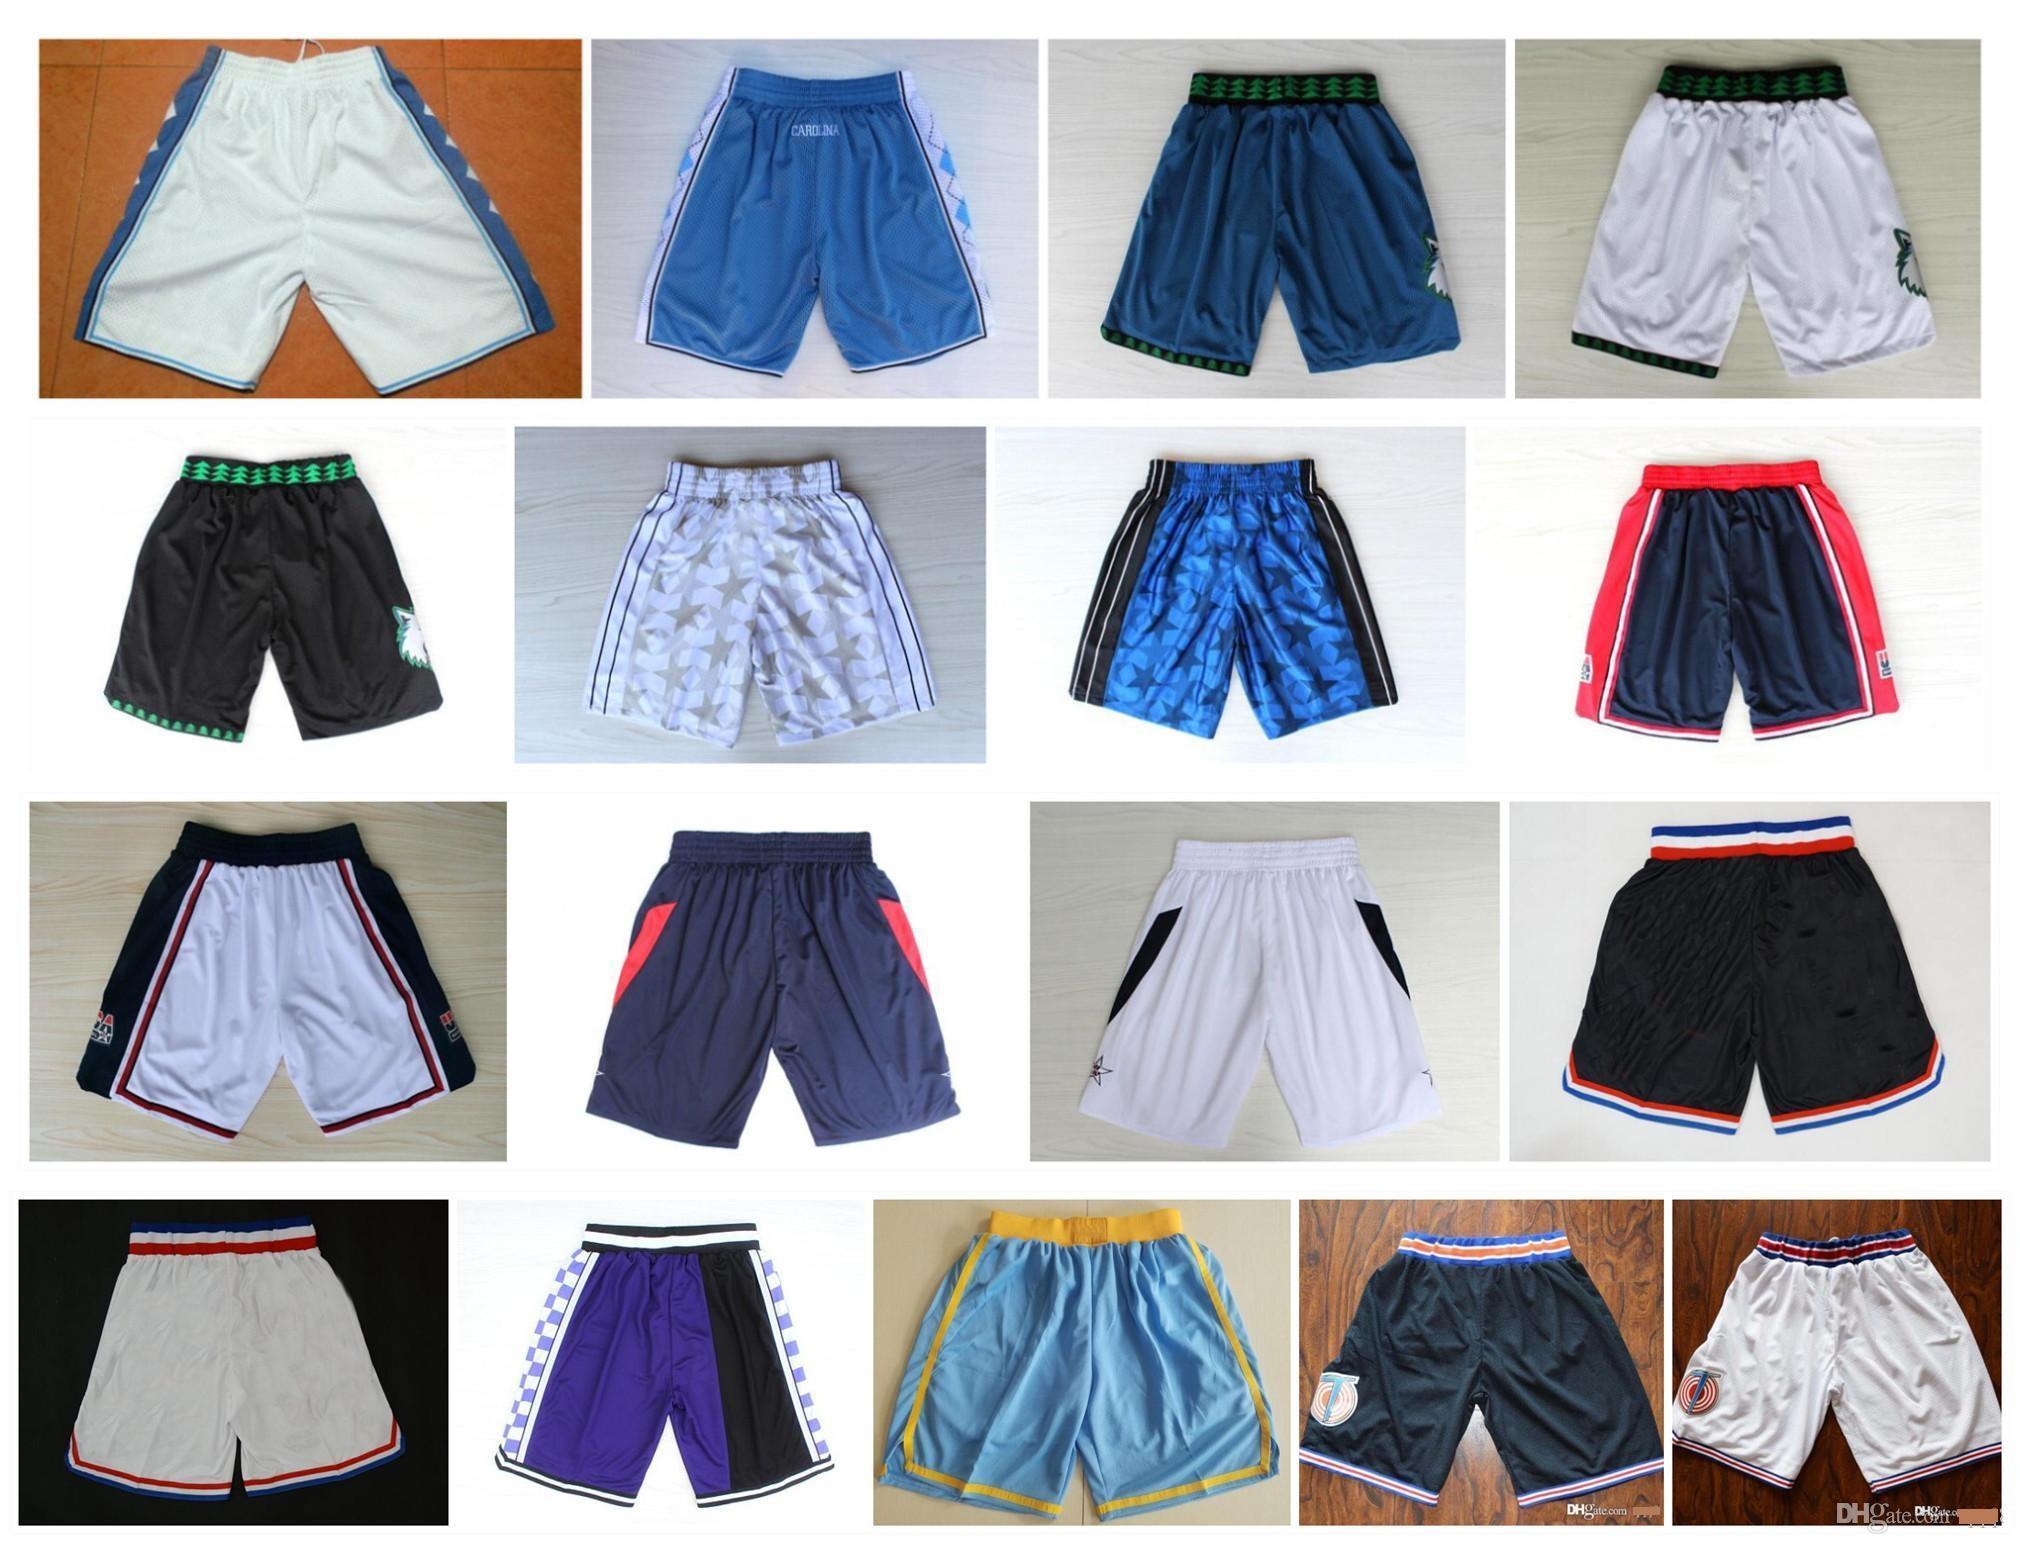 ¡Calidad superior! 2020 Team Shorts Shorts Men Shorts Sports Space Jam Jersey Película Tune Squad Carolina de alquitrán Tar Heels Deporte Pantalones universitarios